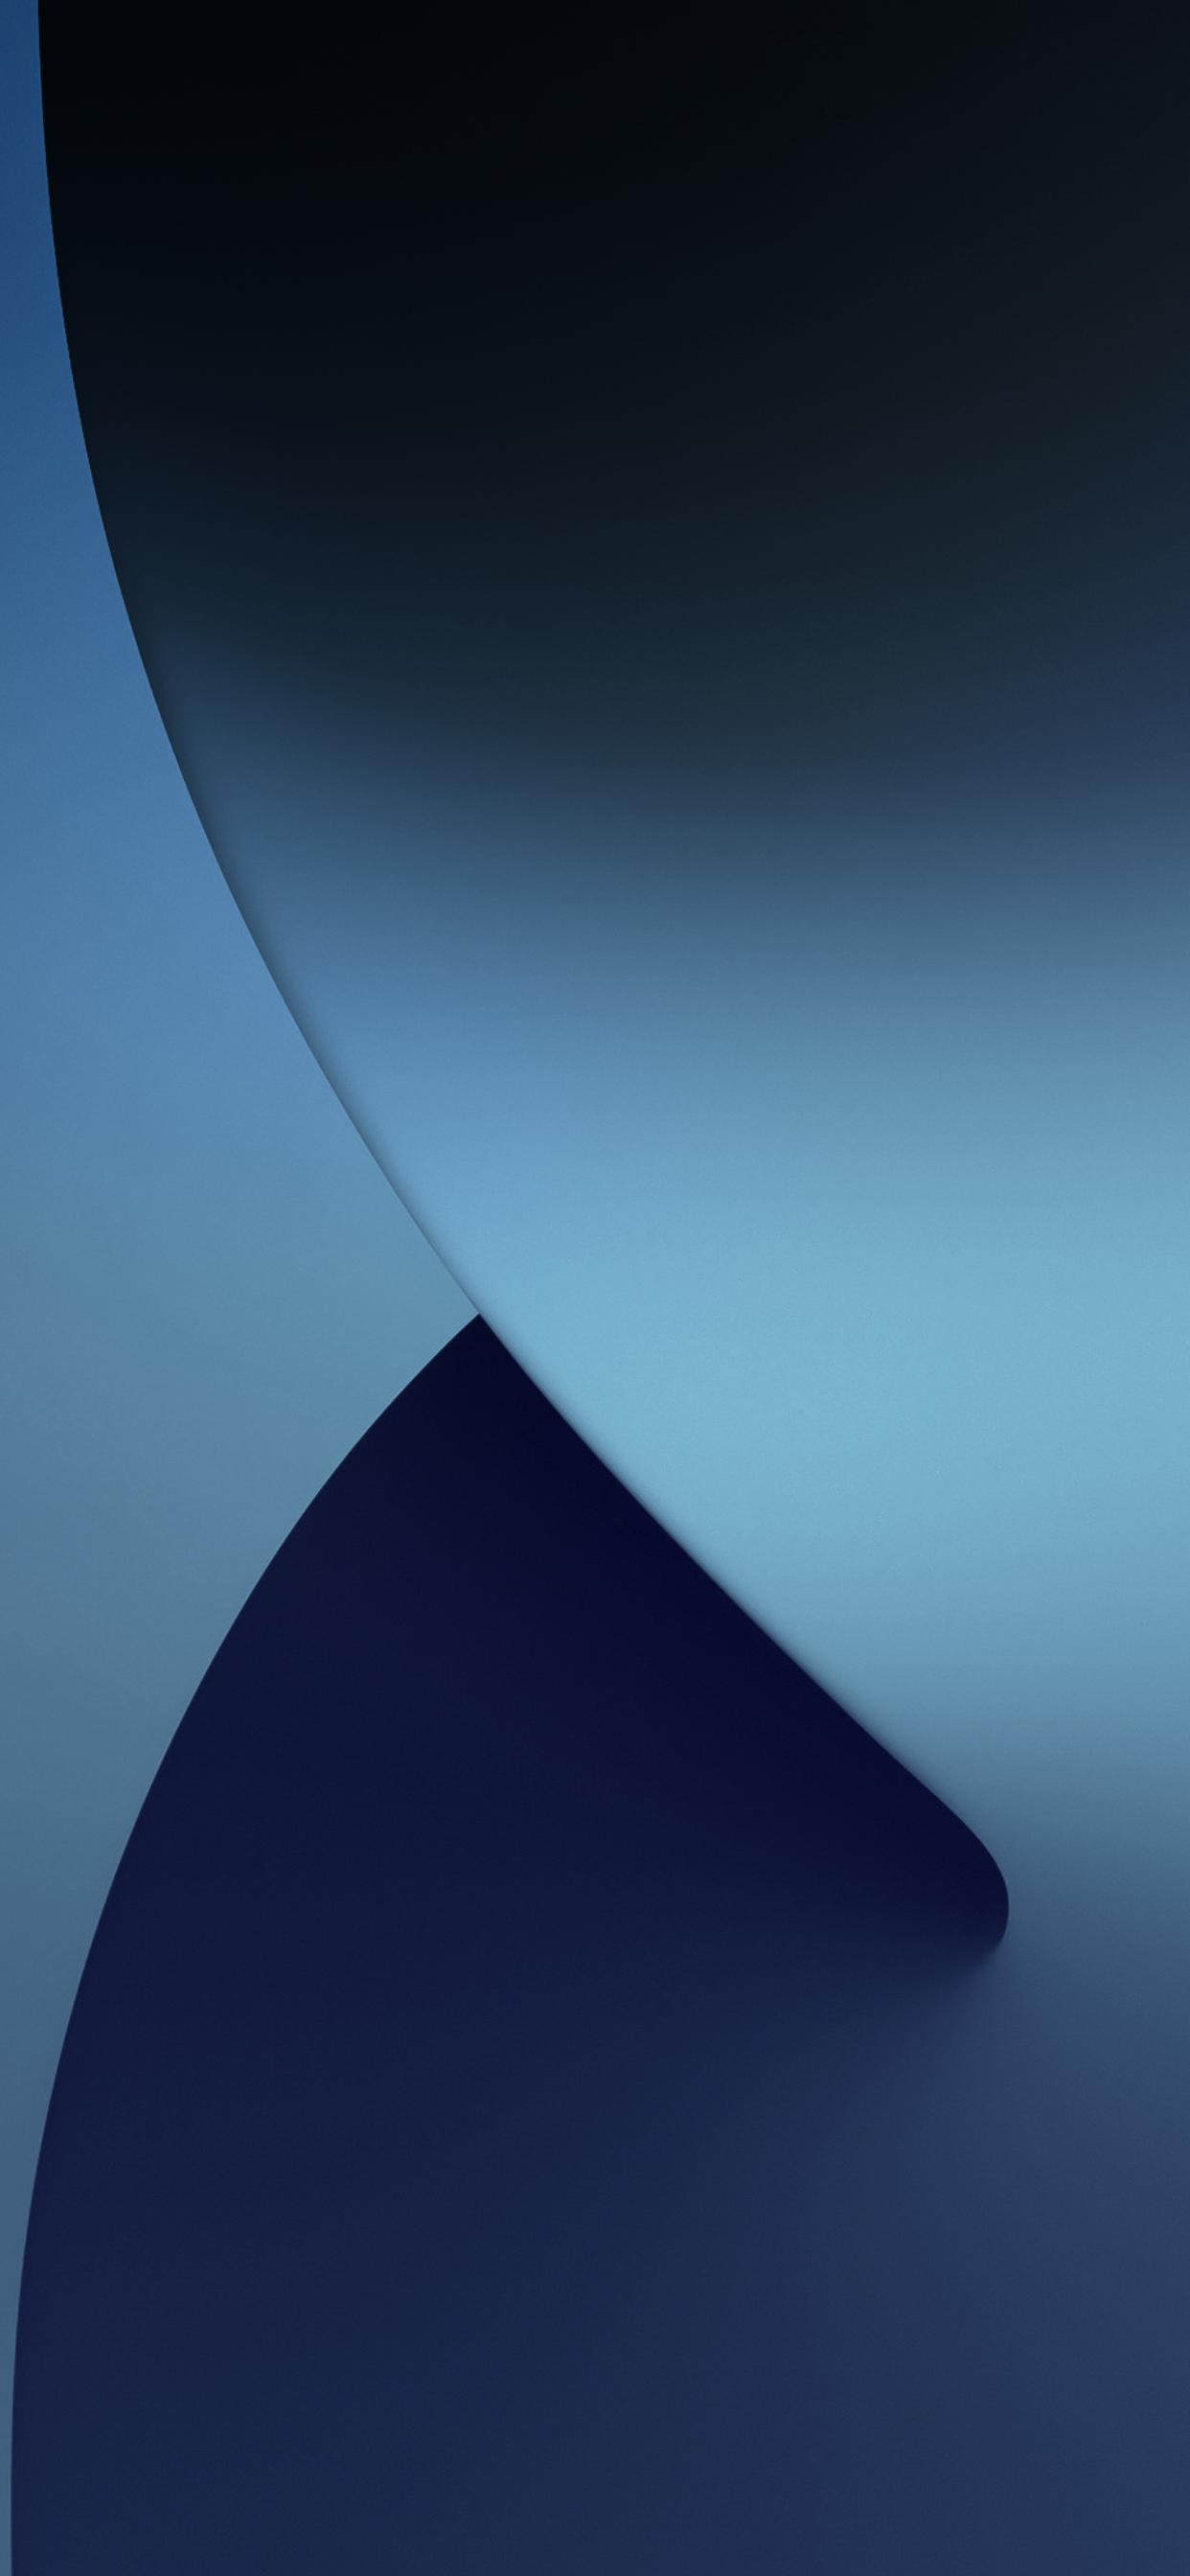 Iphone 12 Wallpaper Modd By Evgeniyzemelko New Wallpaper Iphone Color Wallpaper Iphone Iphone Wallpaper Water